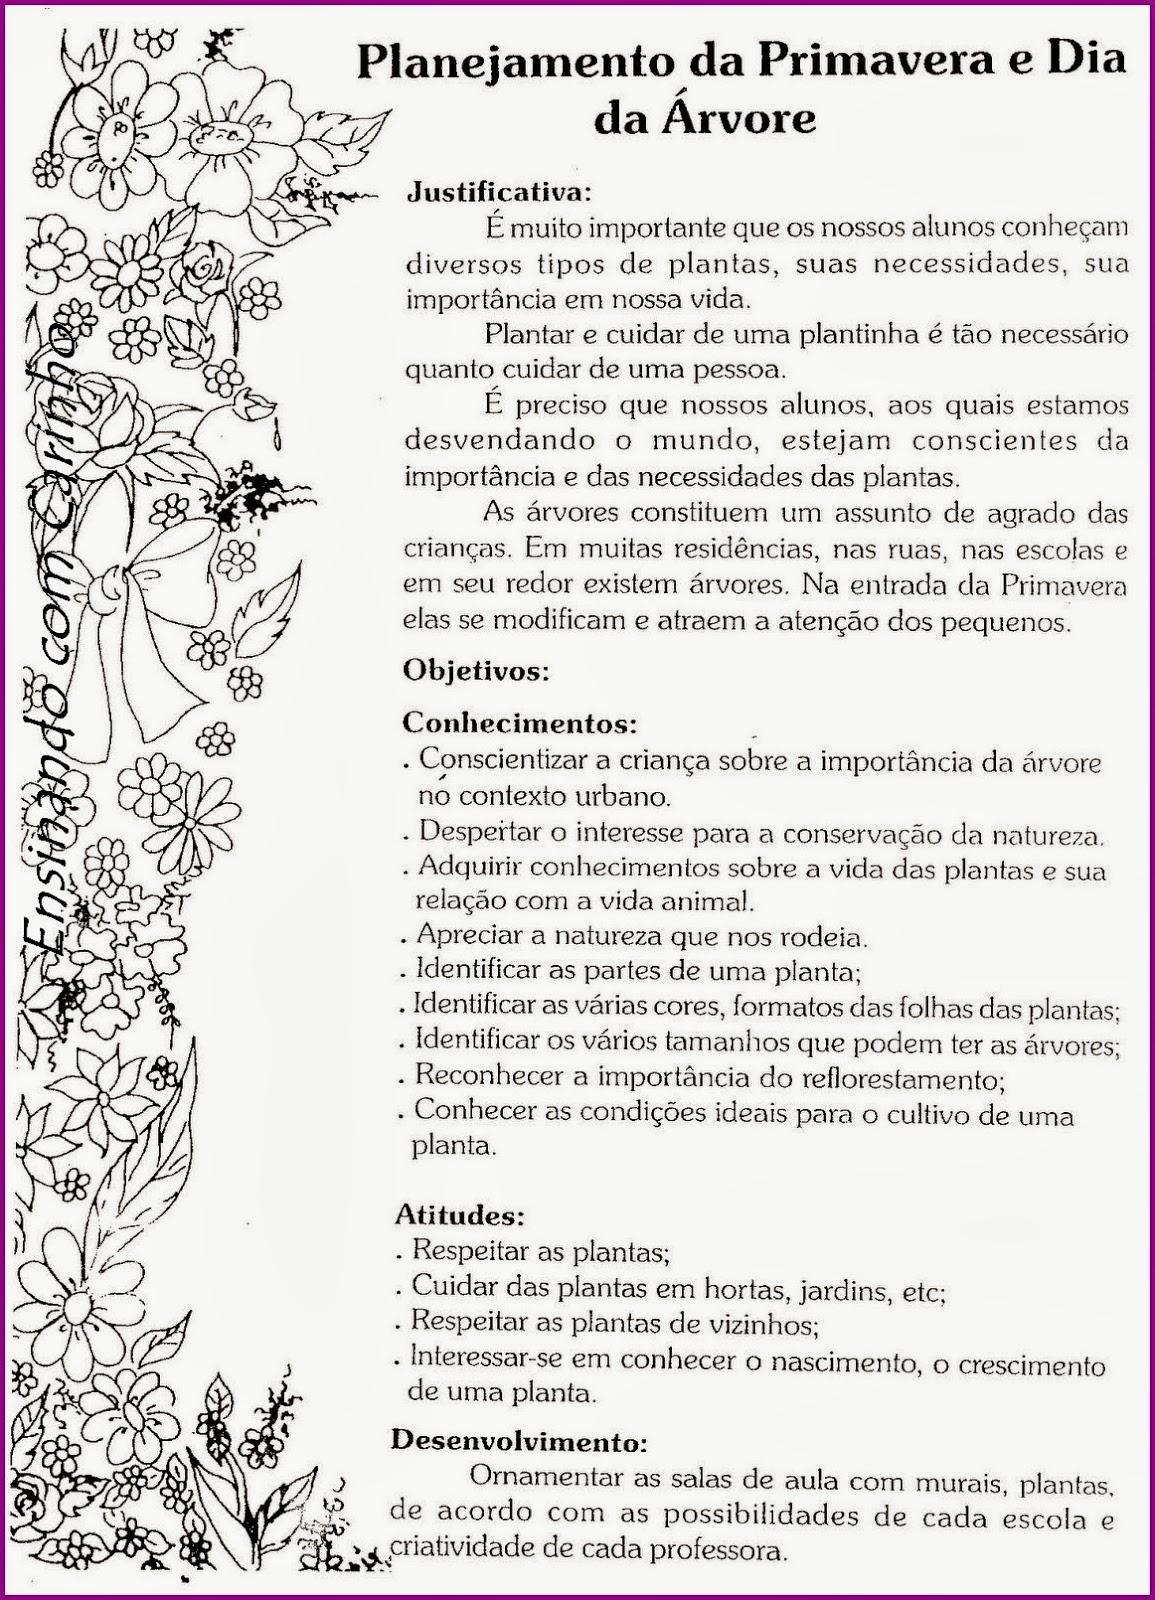 Preferência www.canal-educar.net: Projeto Primavera e dia da árvore ZZ74